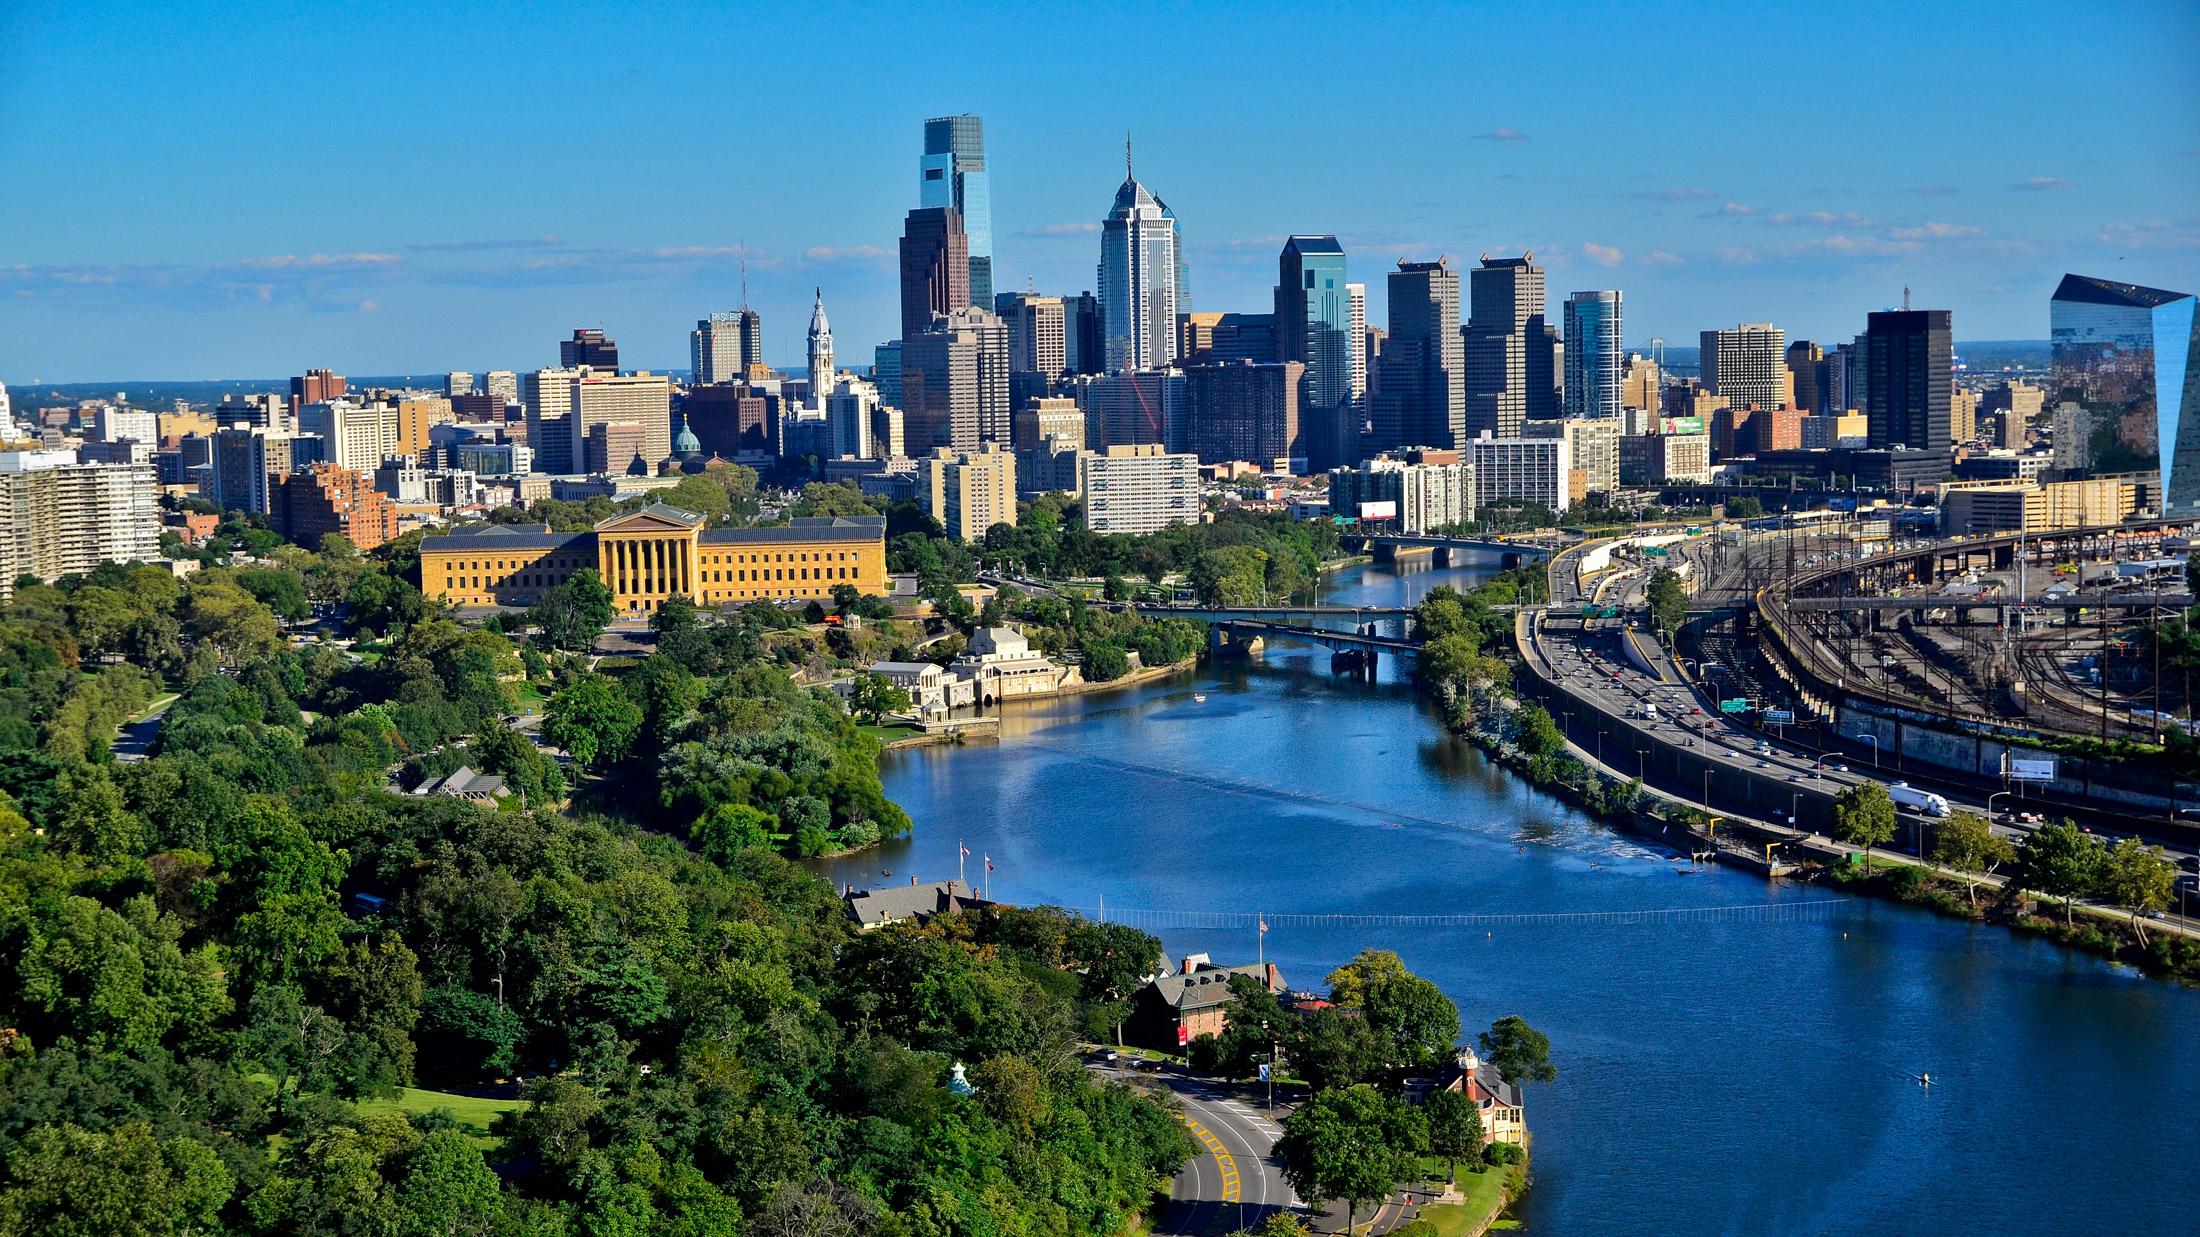 Minneapolis to Philadelphia or Vice Versa $57 RT Nonstop Airfares on Sun Country (Very Limited Travel Nov-Dec 2019)